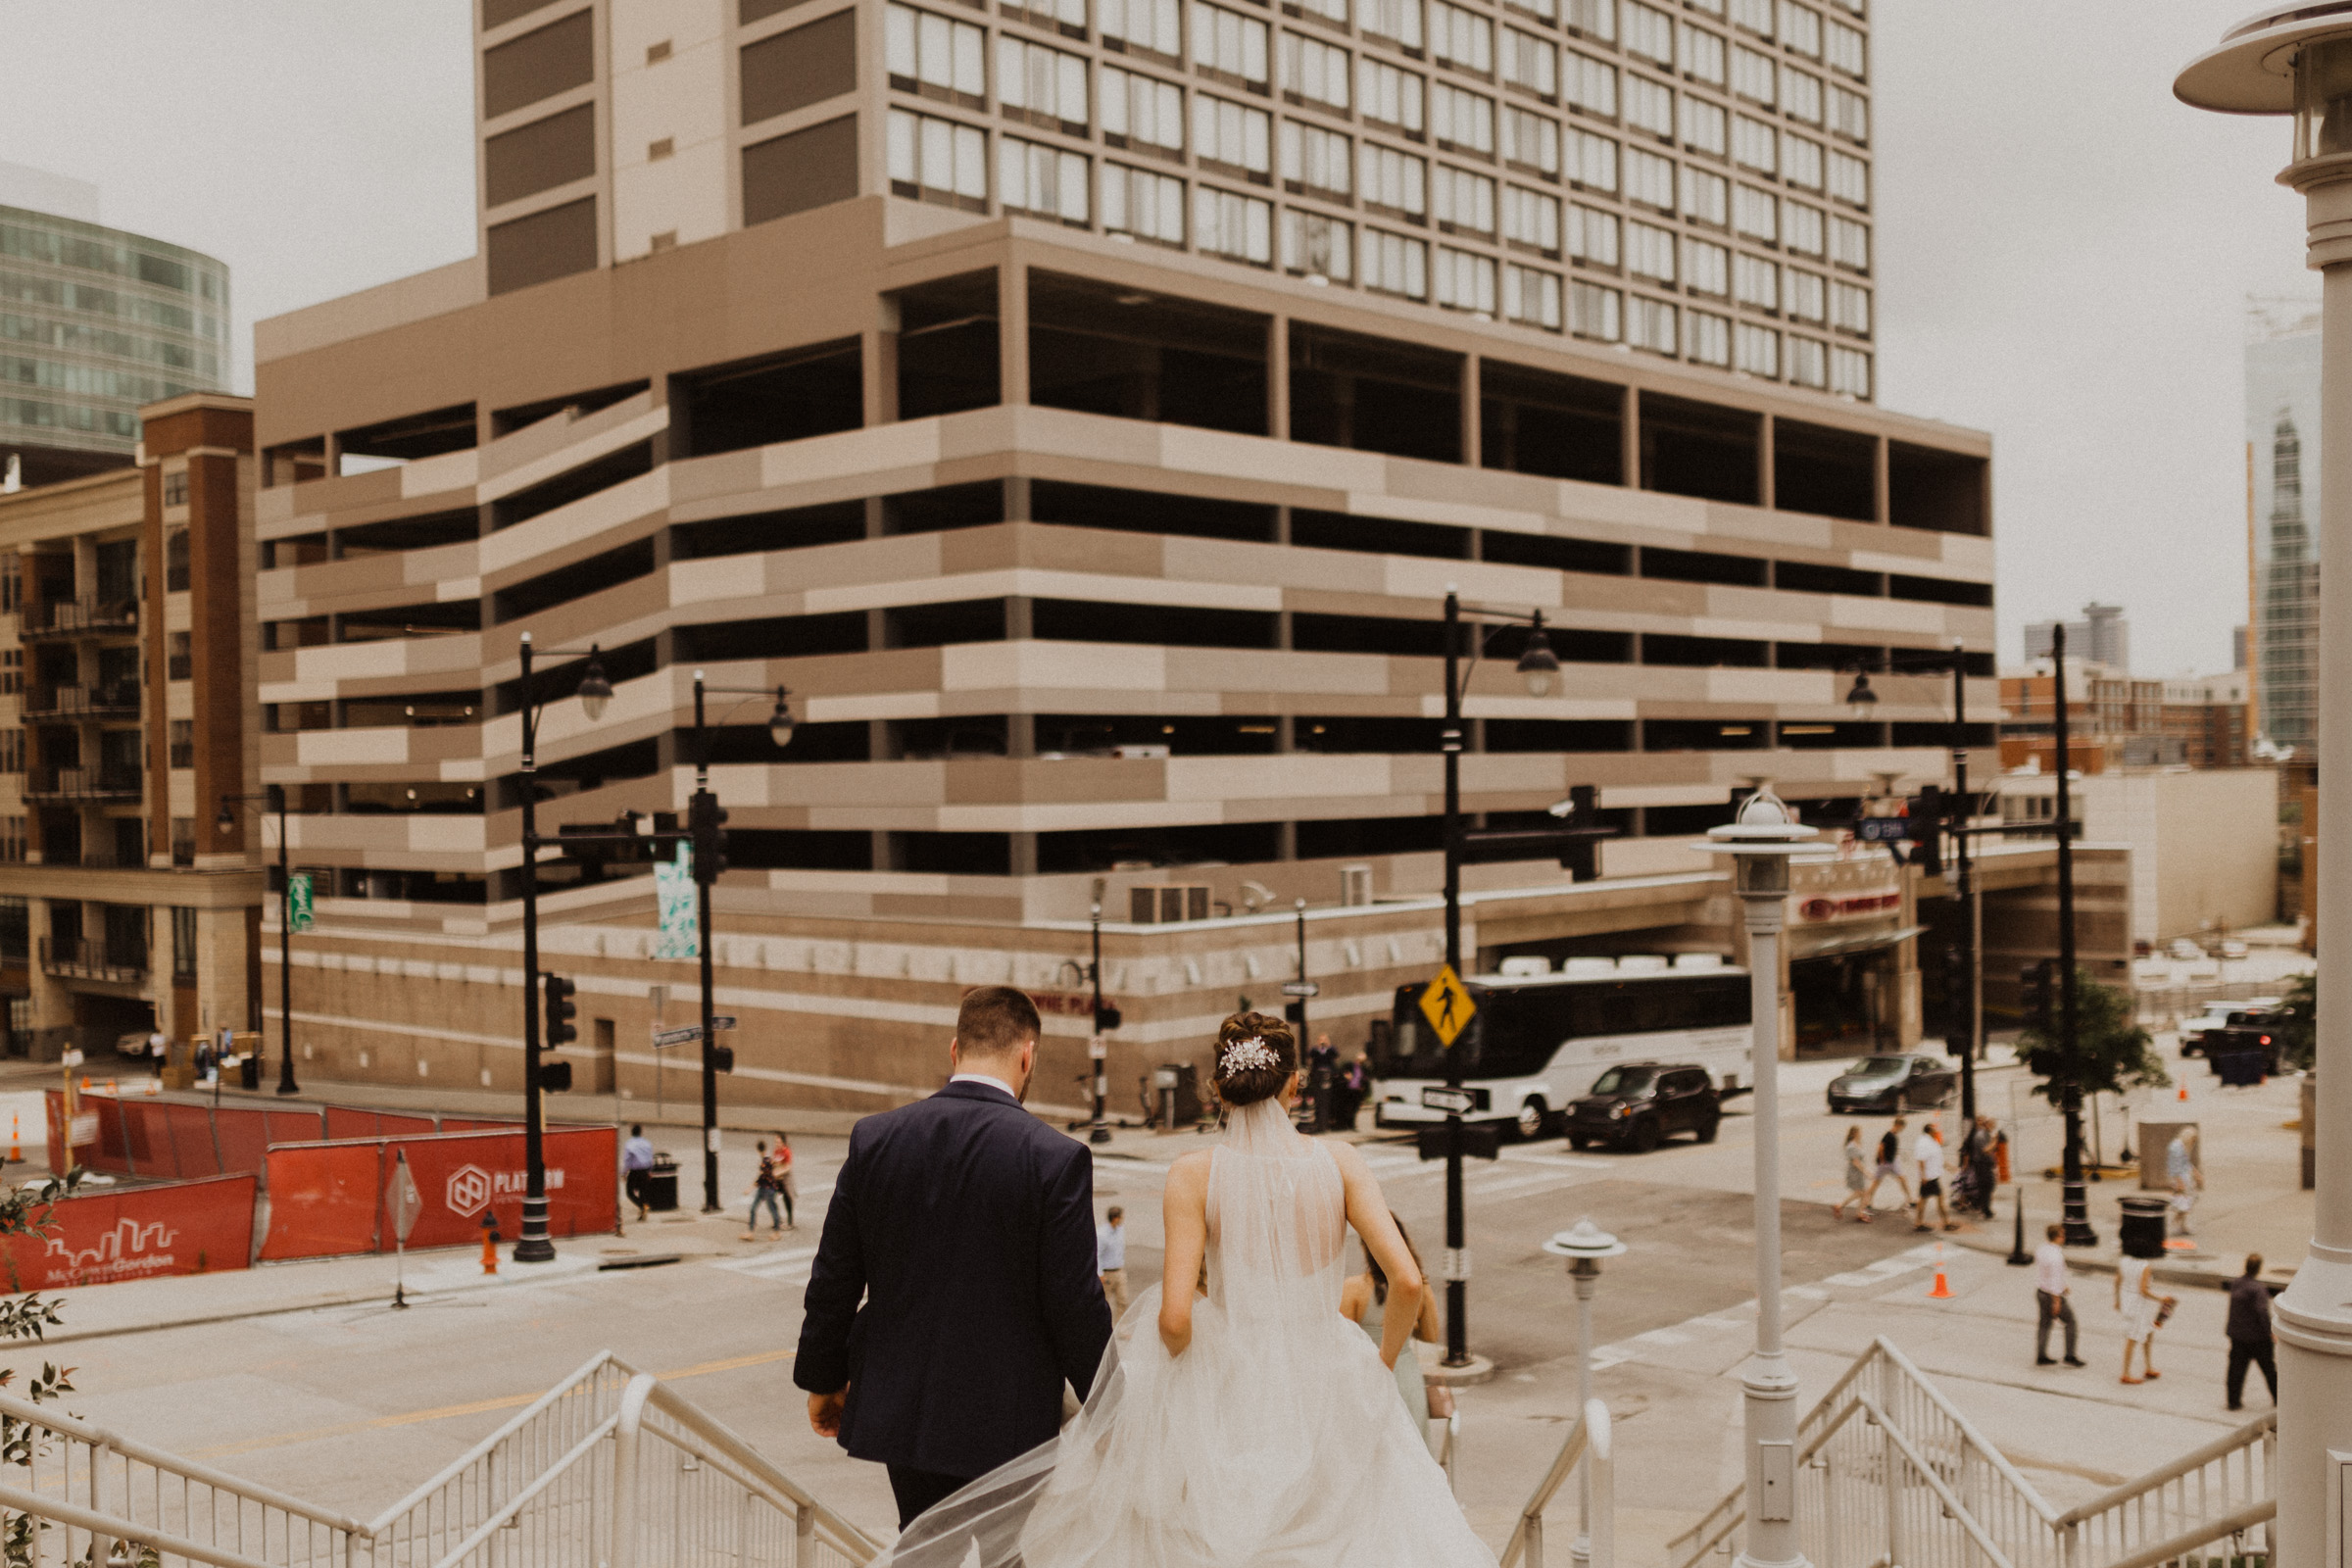 alyssa barletter photography classic downtown kansas city wedding boulevard brewery-13.jpg